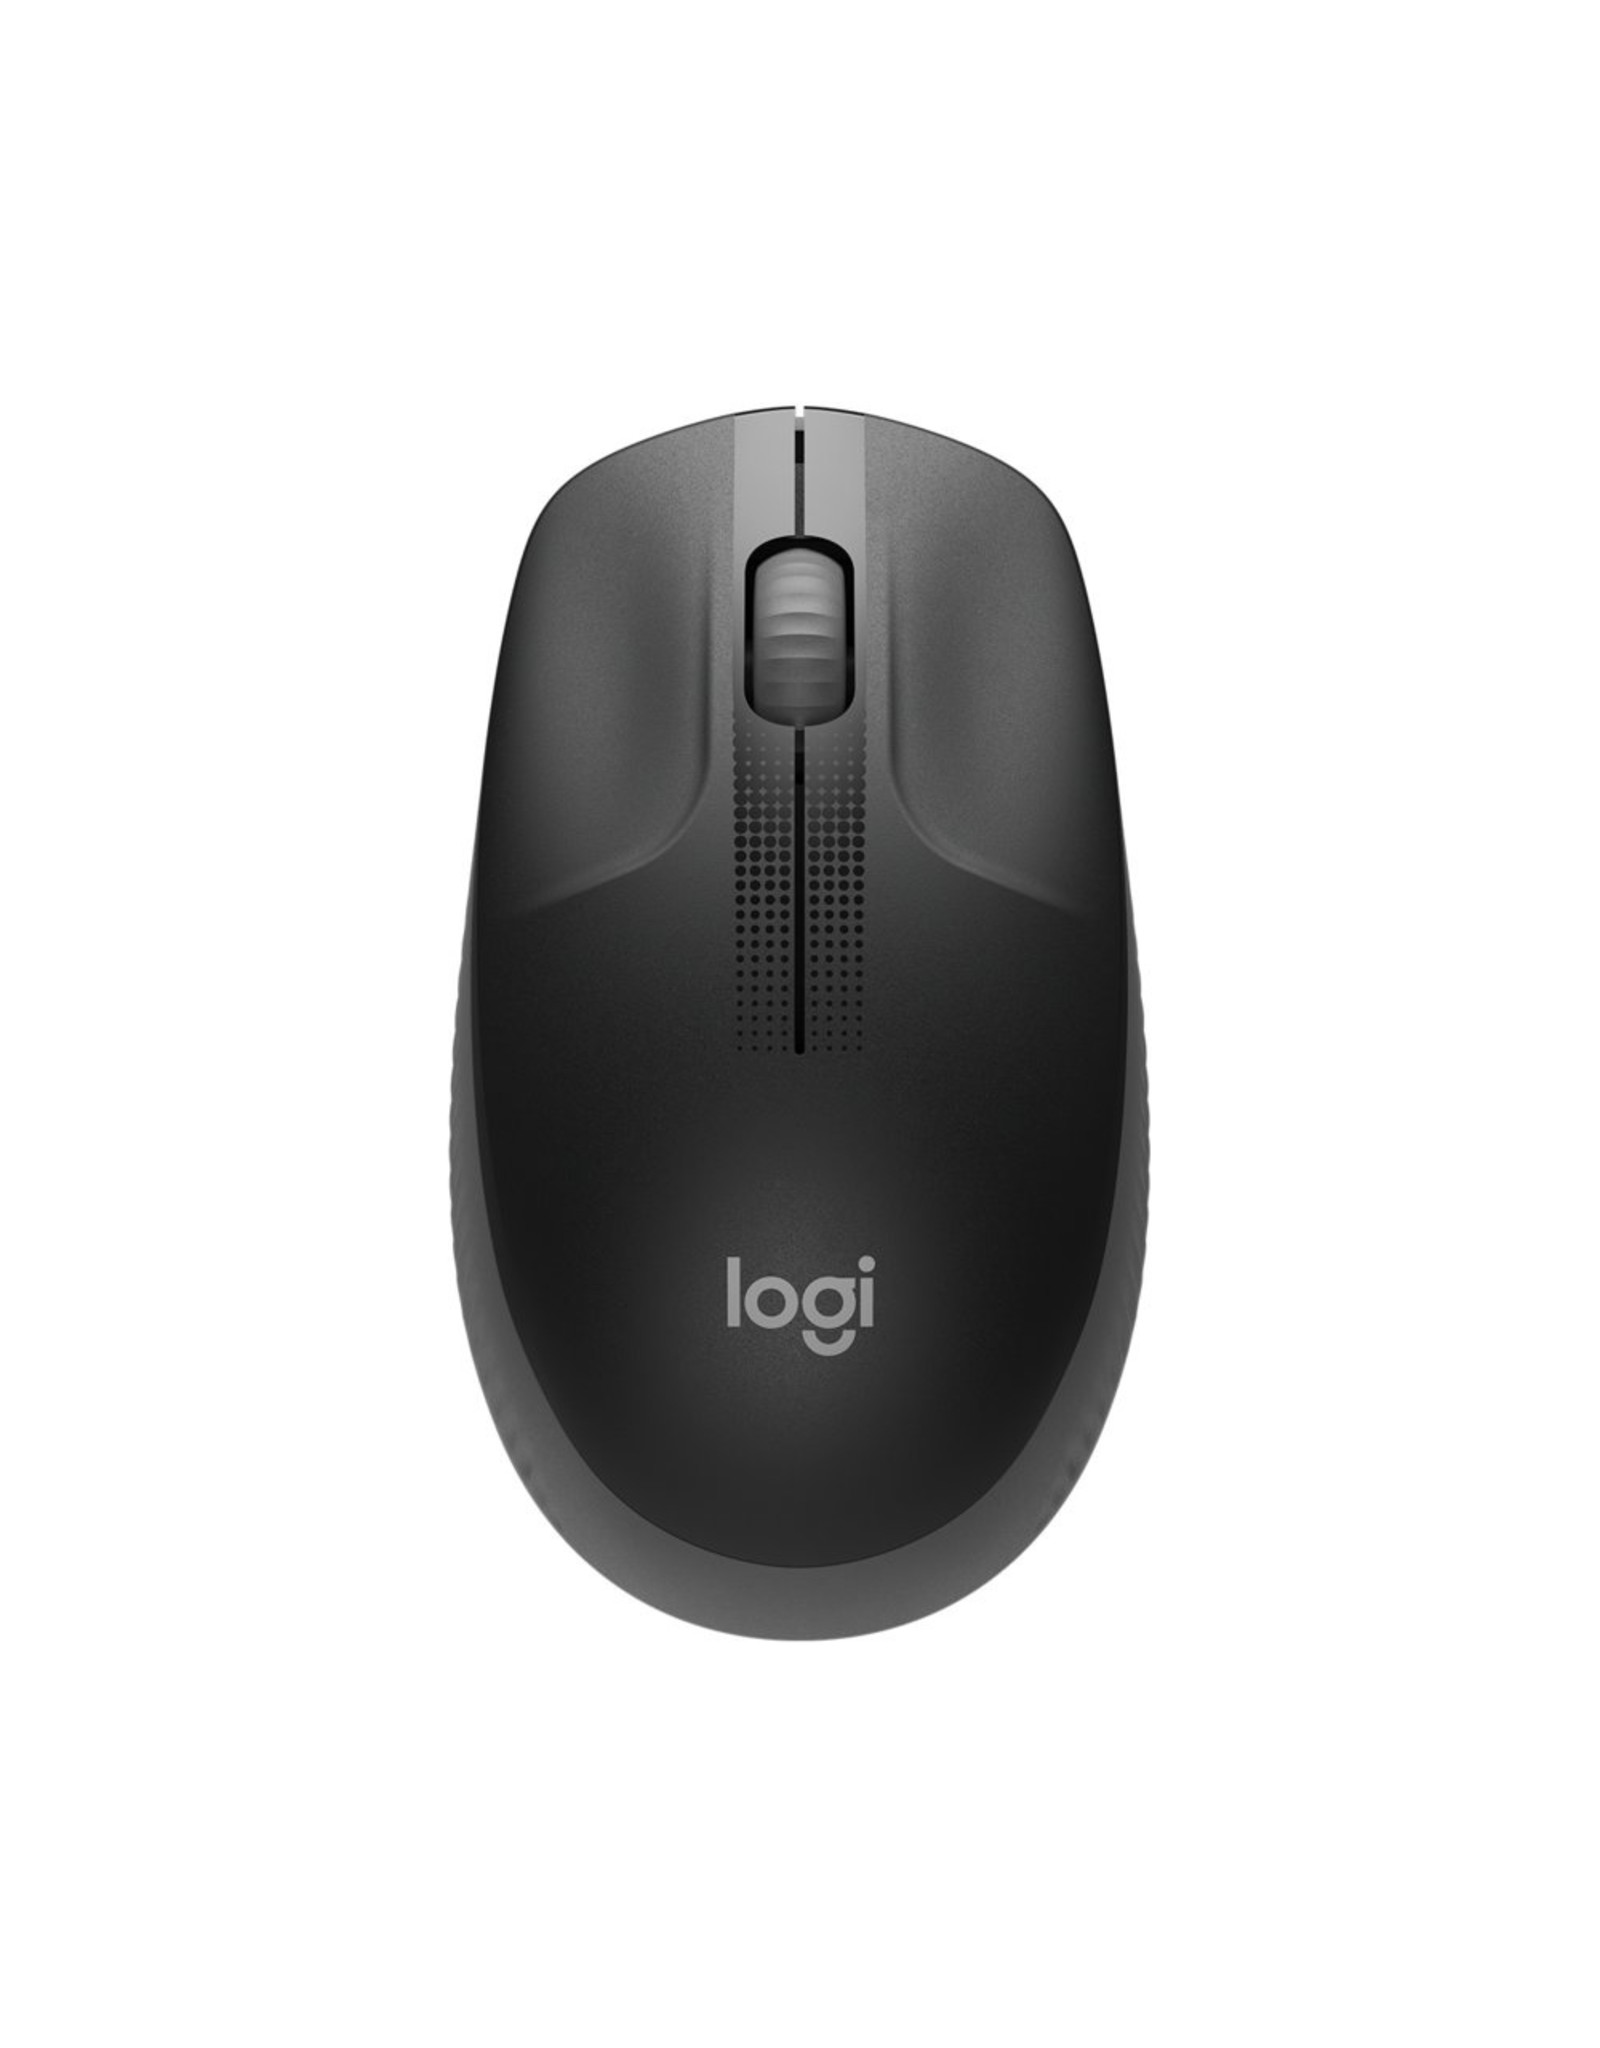 Logitech M190 wireless mouse Black